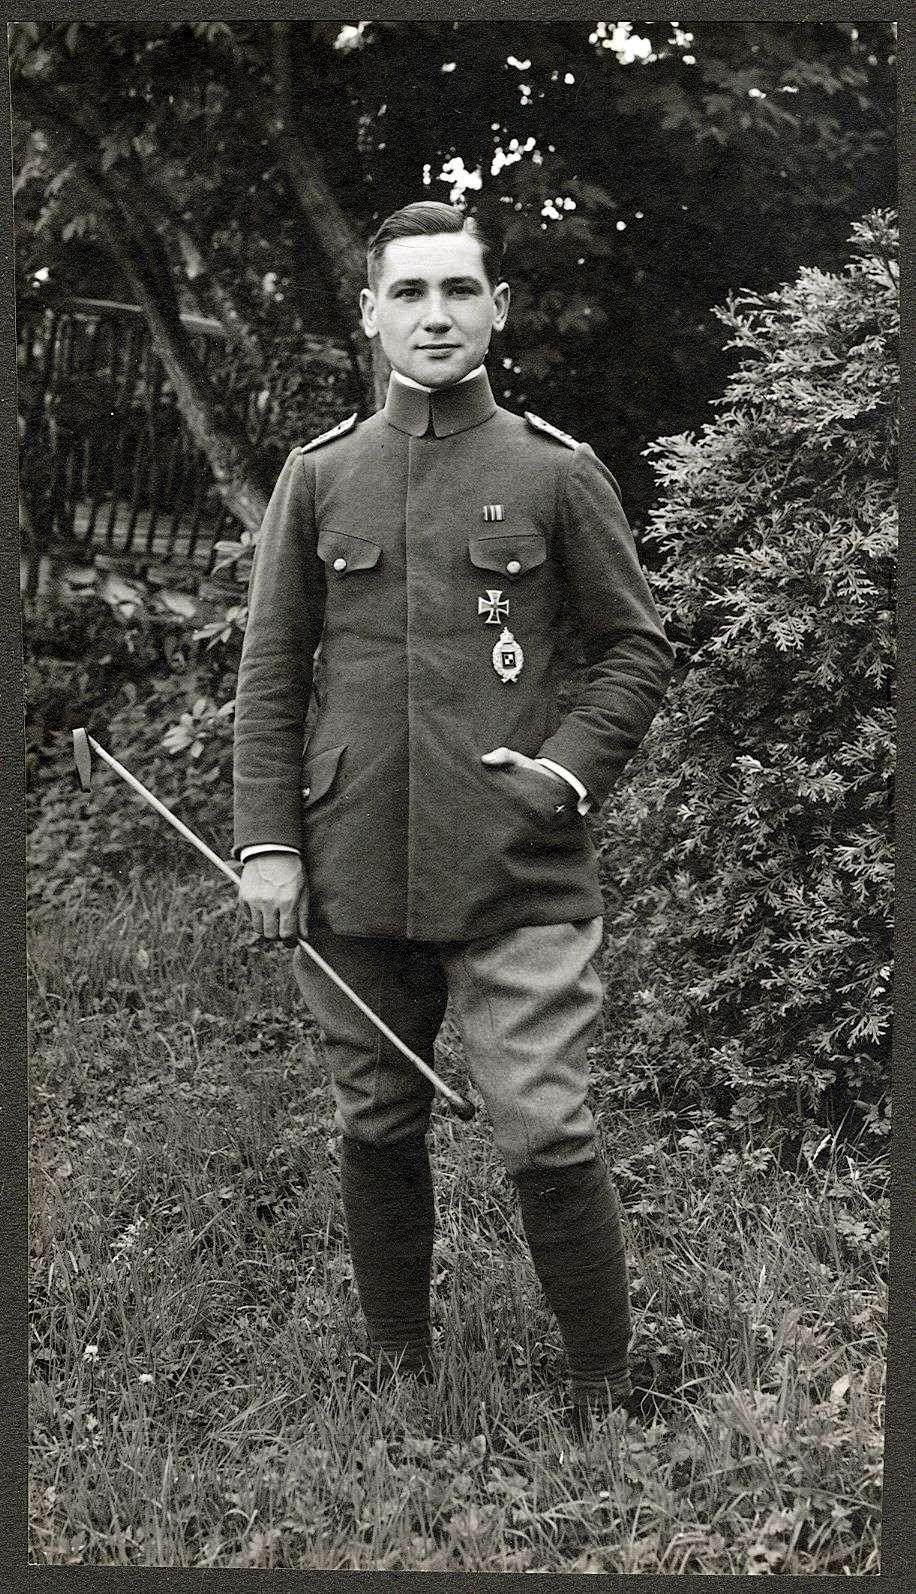 Bertsch, Hans, Dipl. Ingenieur, Bild 2